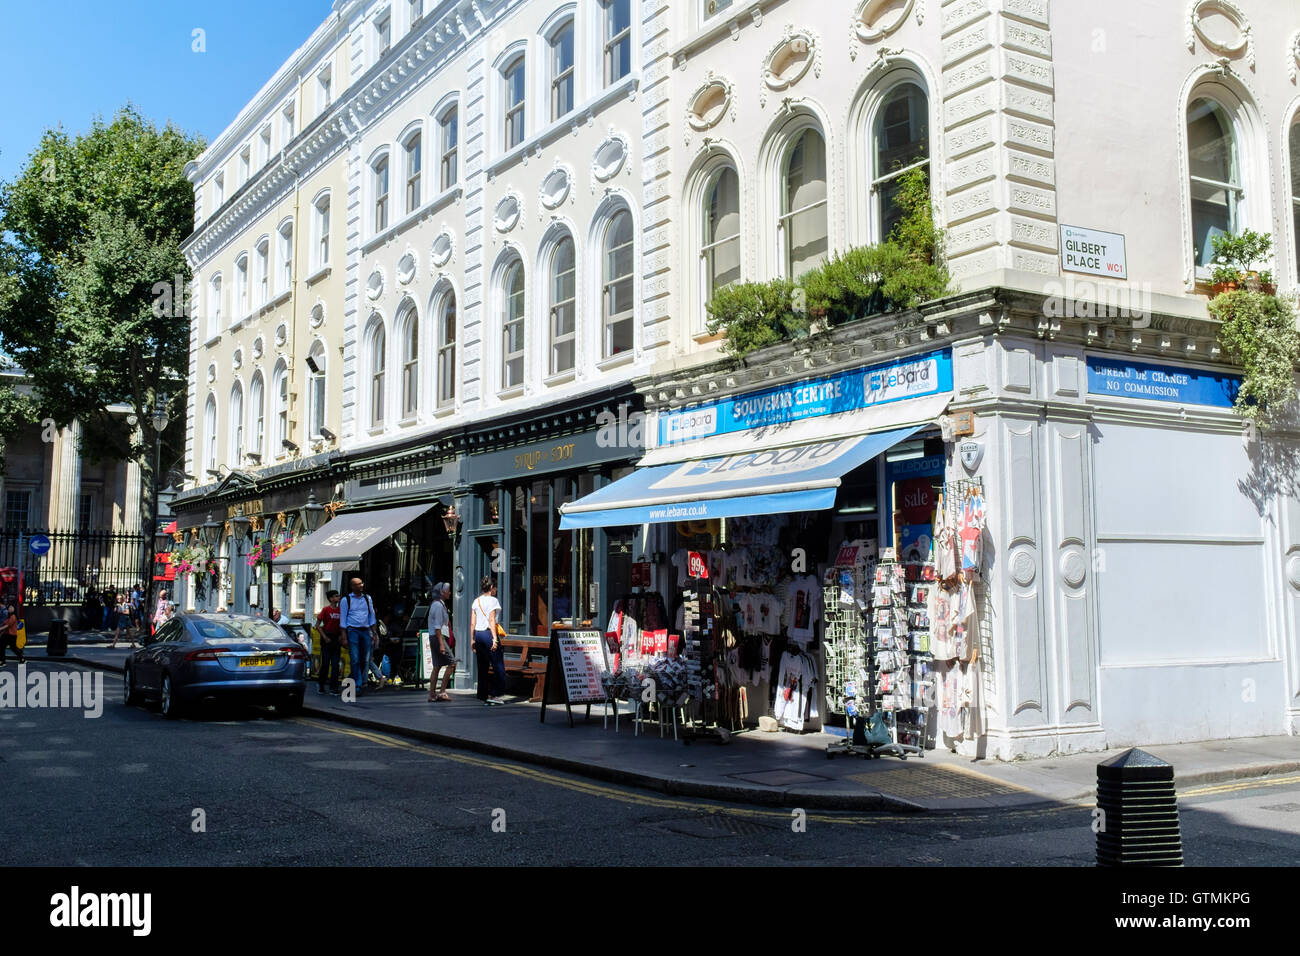 Museum street, Bloomsbury, London, UK - Stock Image